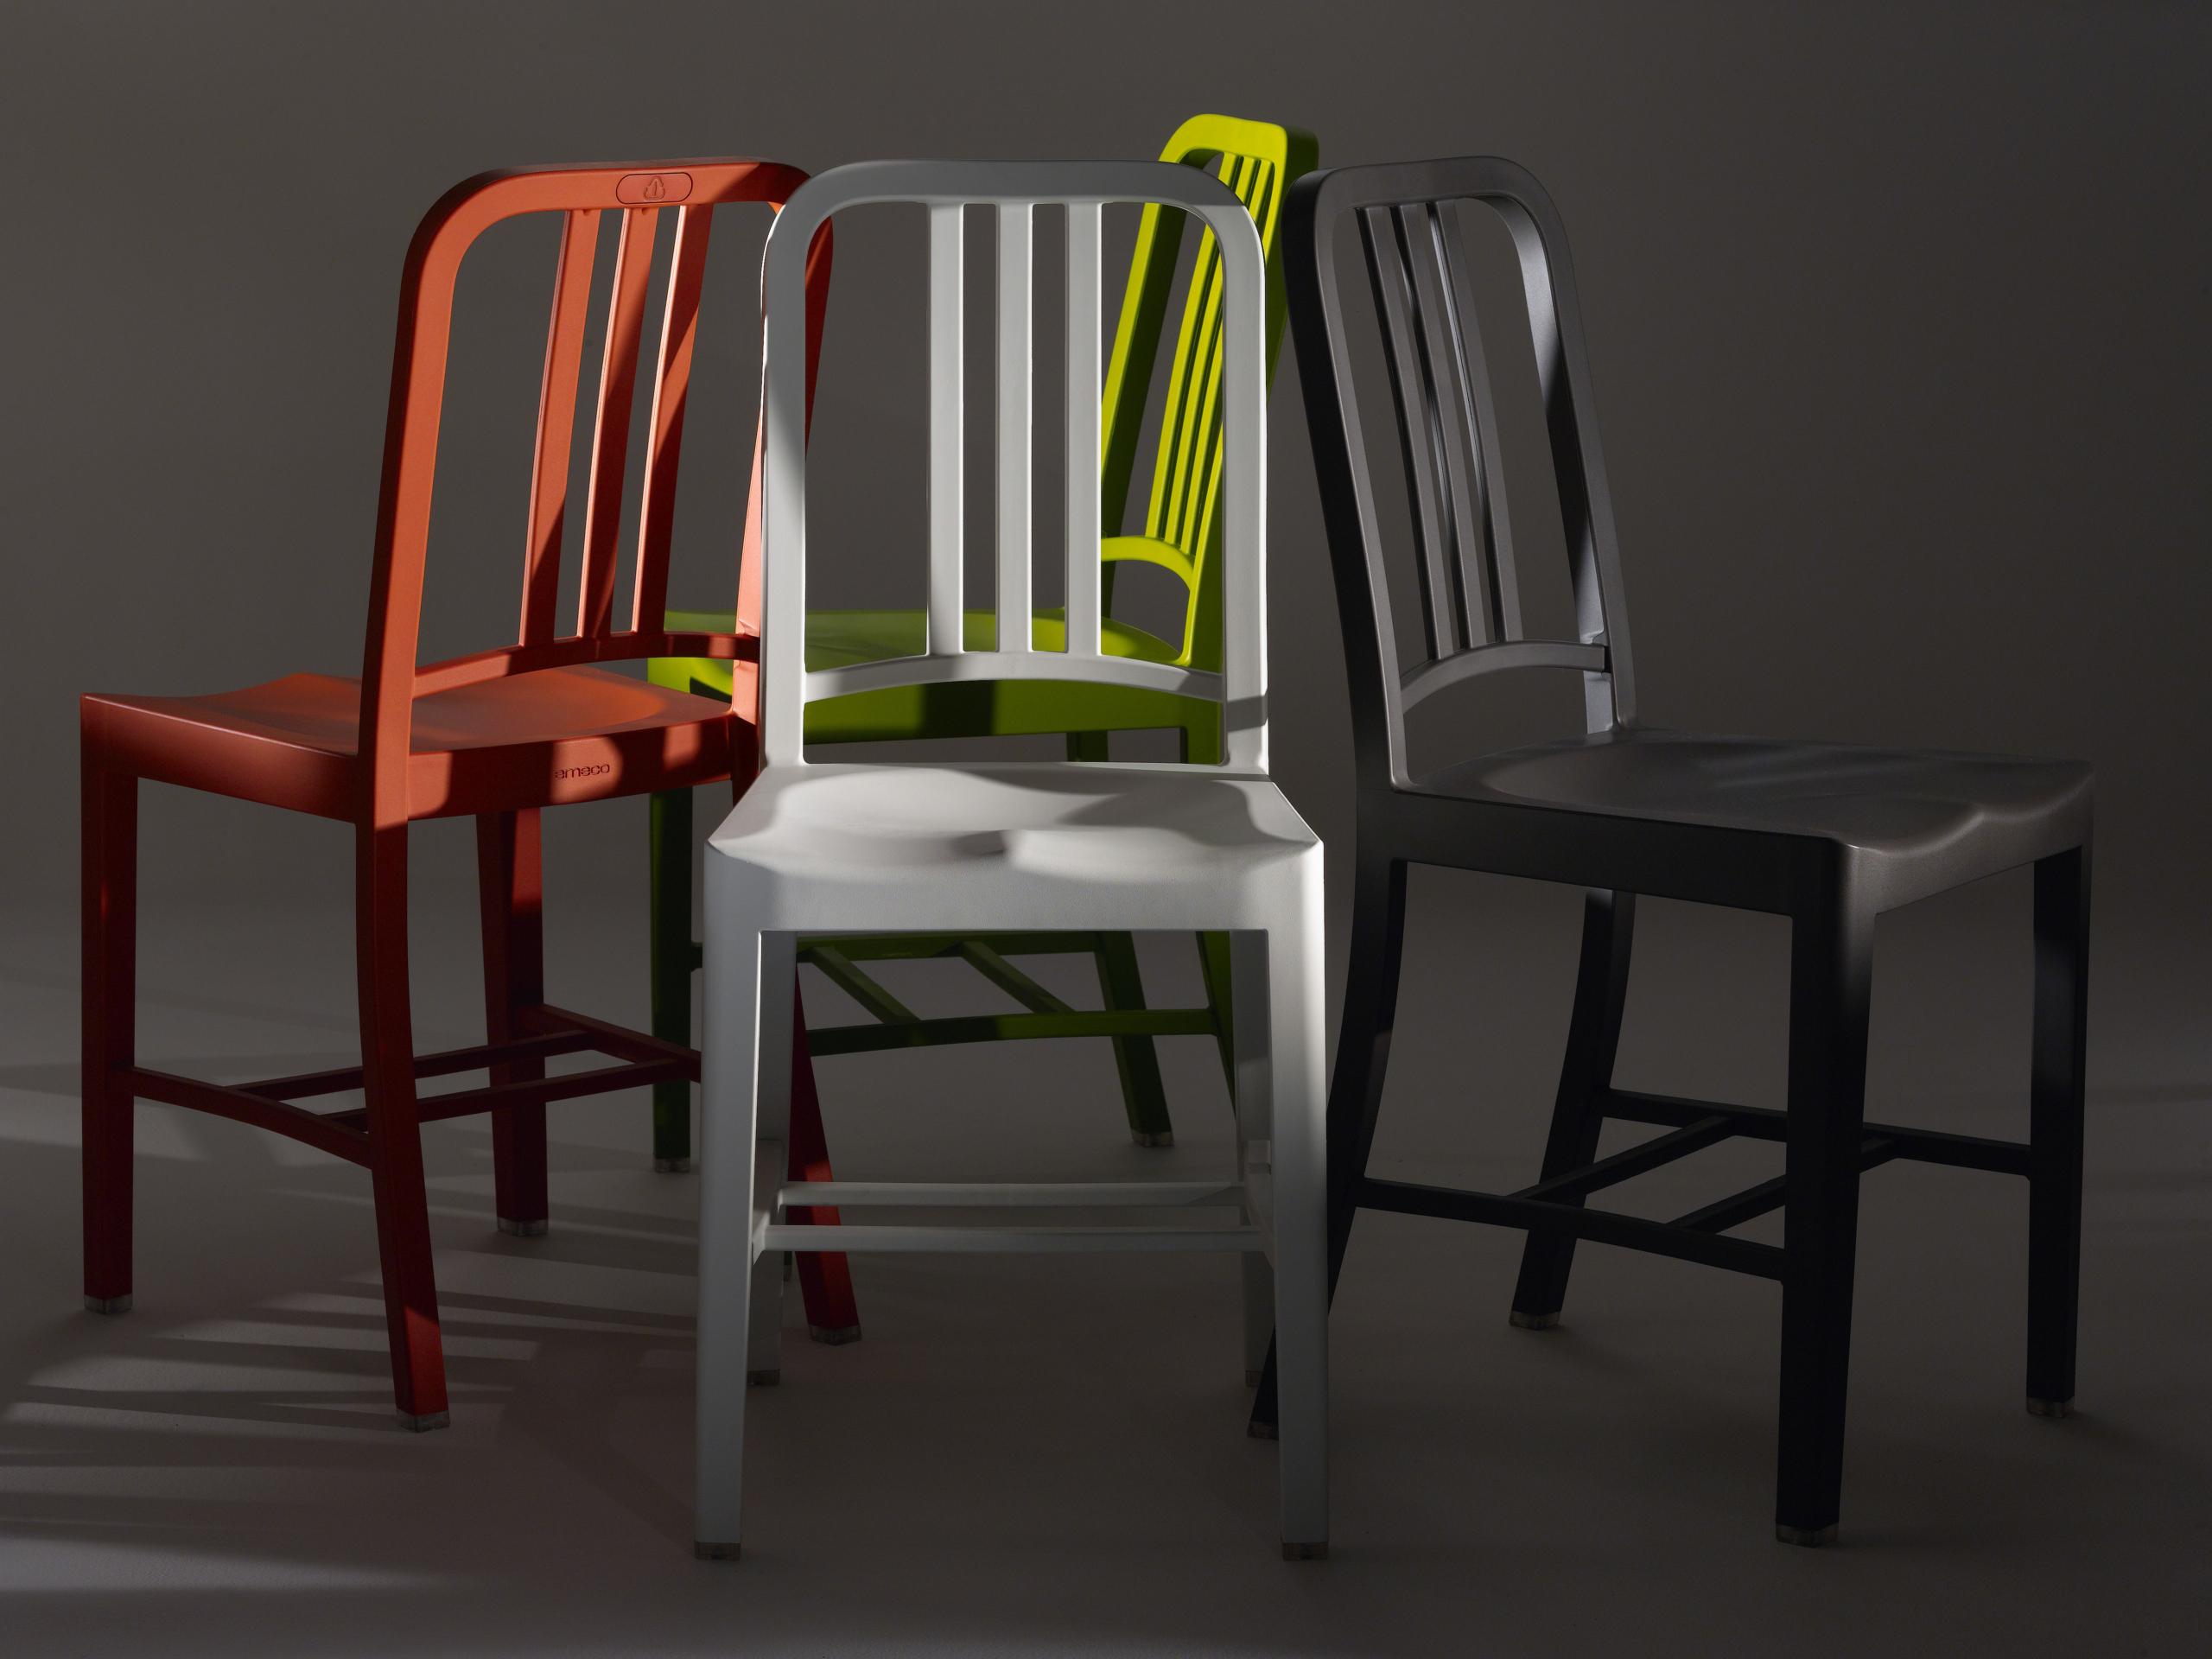 111-navy-chair-stol-emeco-lanna-mobler-handla-online-2